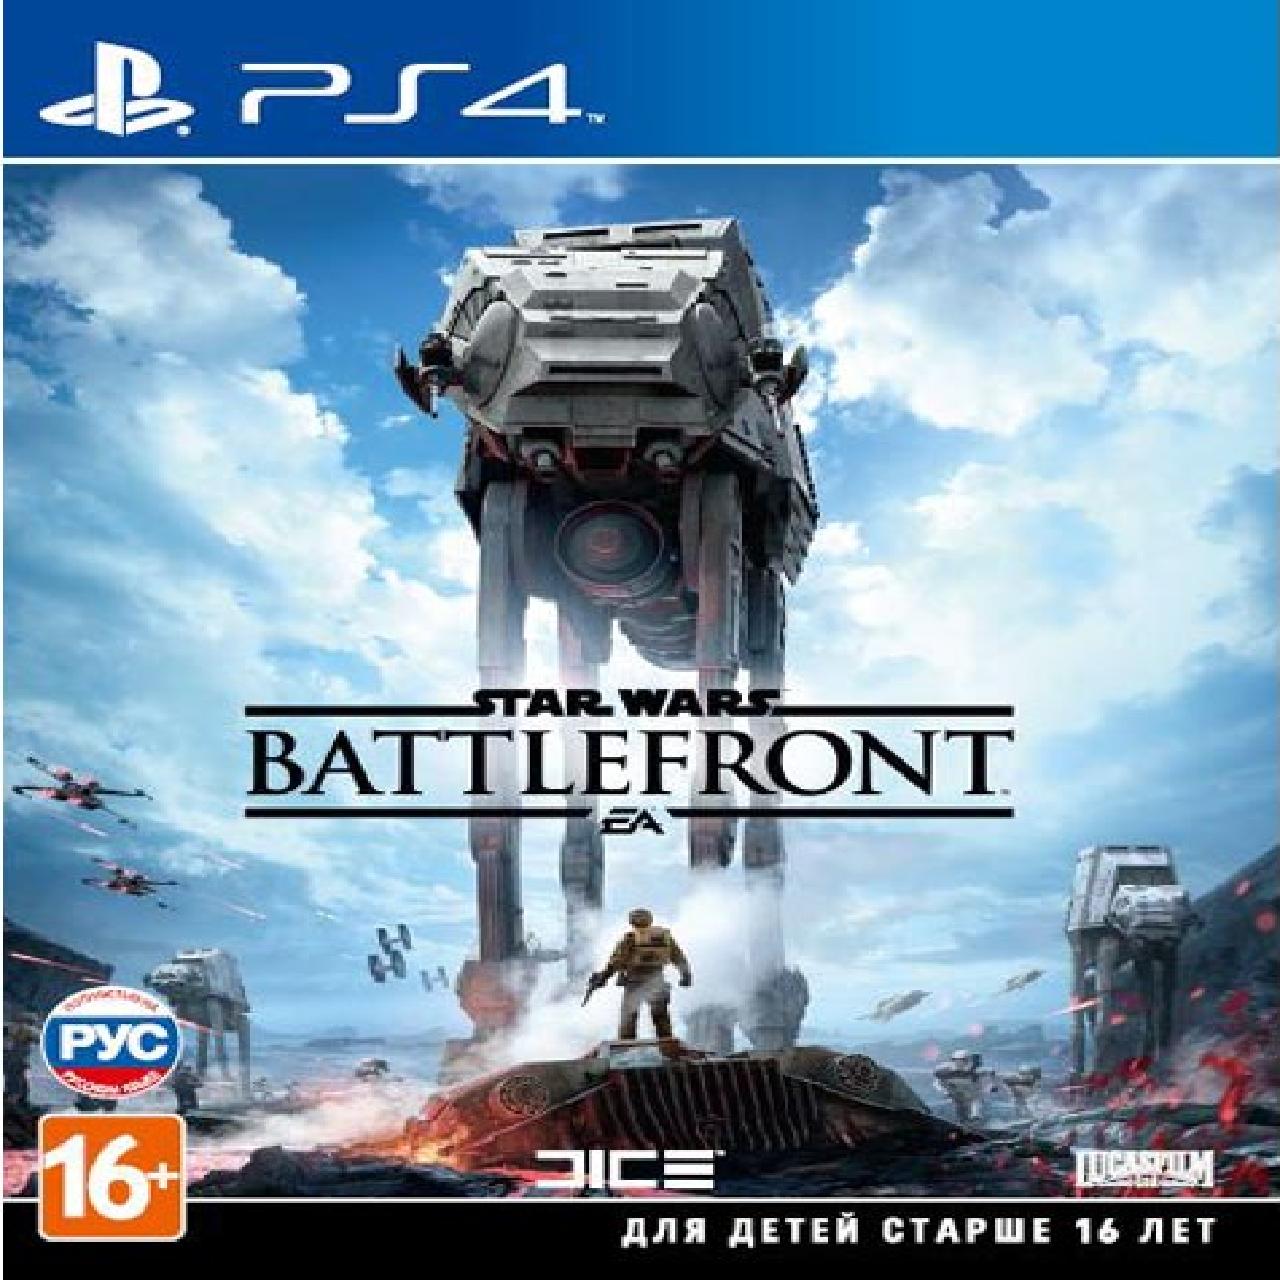 Star Wars: Battlefront RUS PS4 (Б/В)